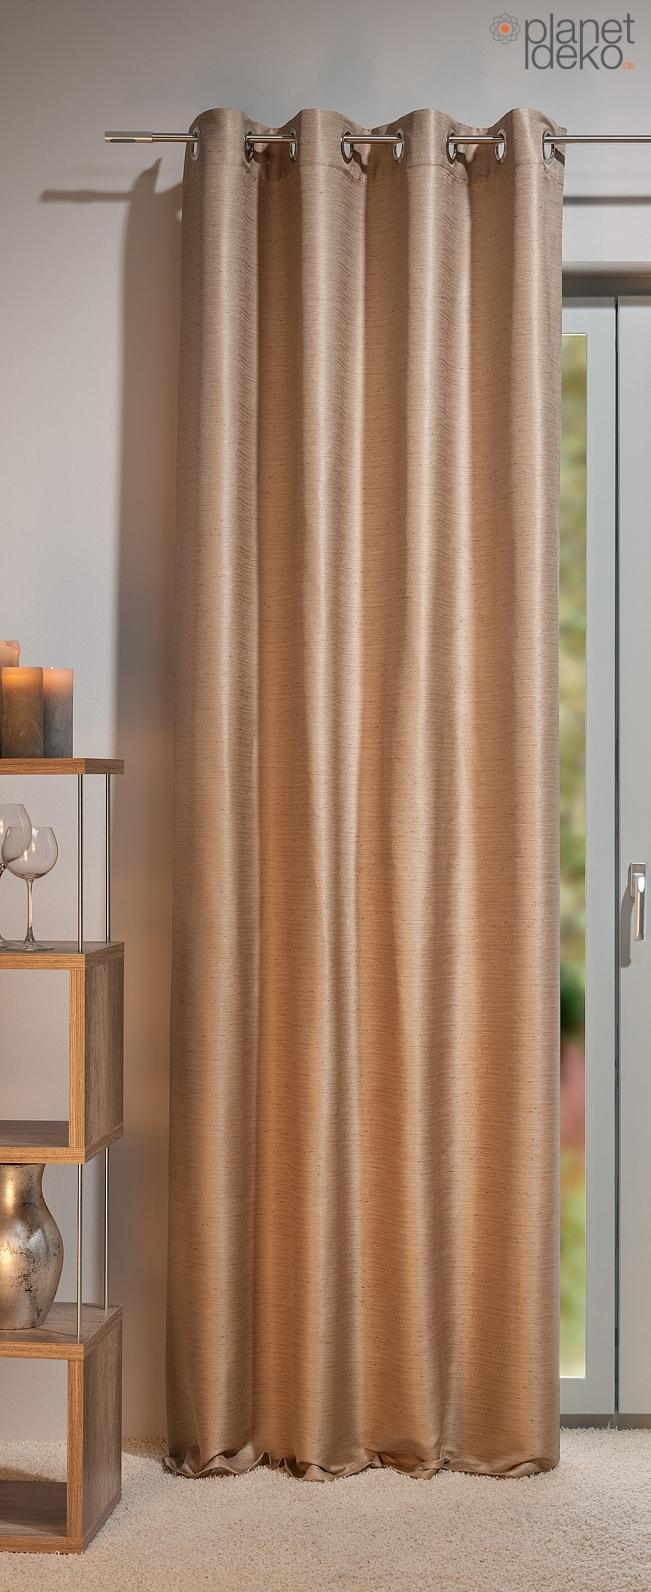 gardinen deko heco gardinen jaipur gardinen dekoration. Black Bedroom Furniture Sets. Home Design Ideas